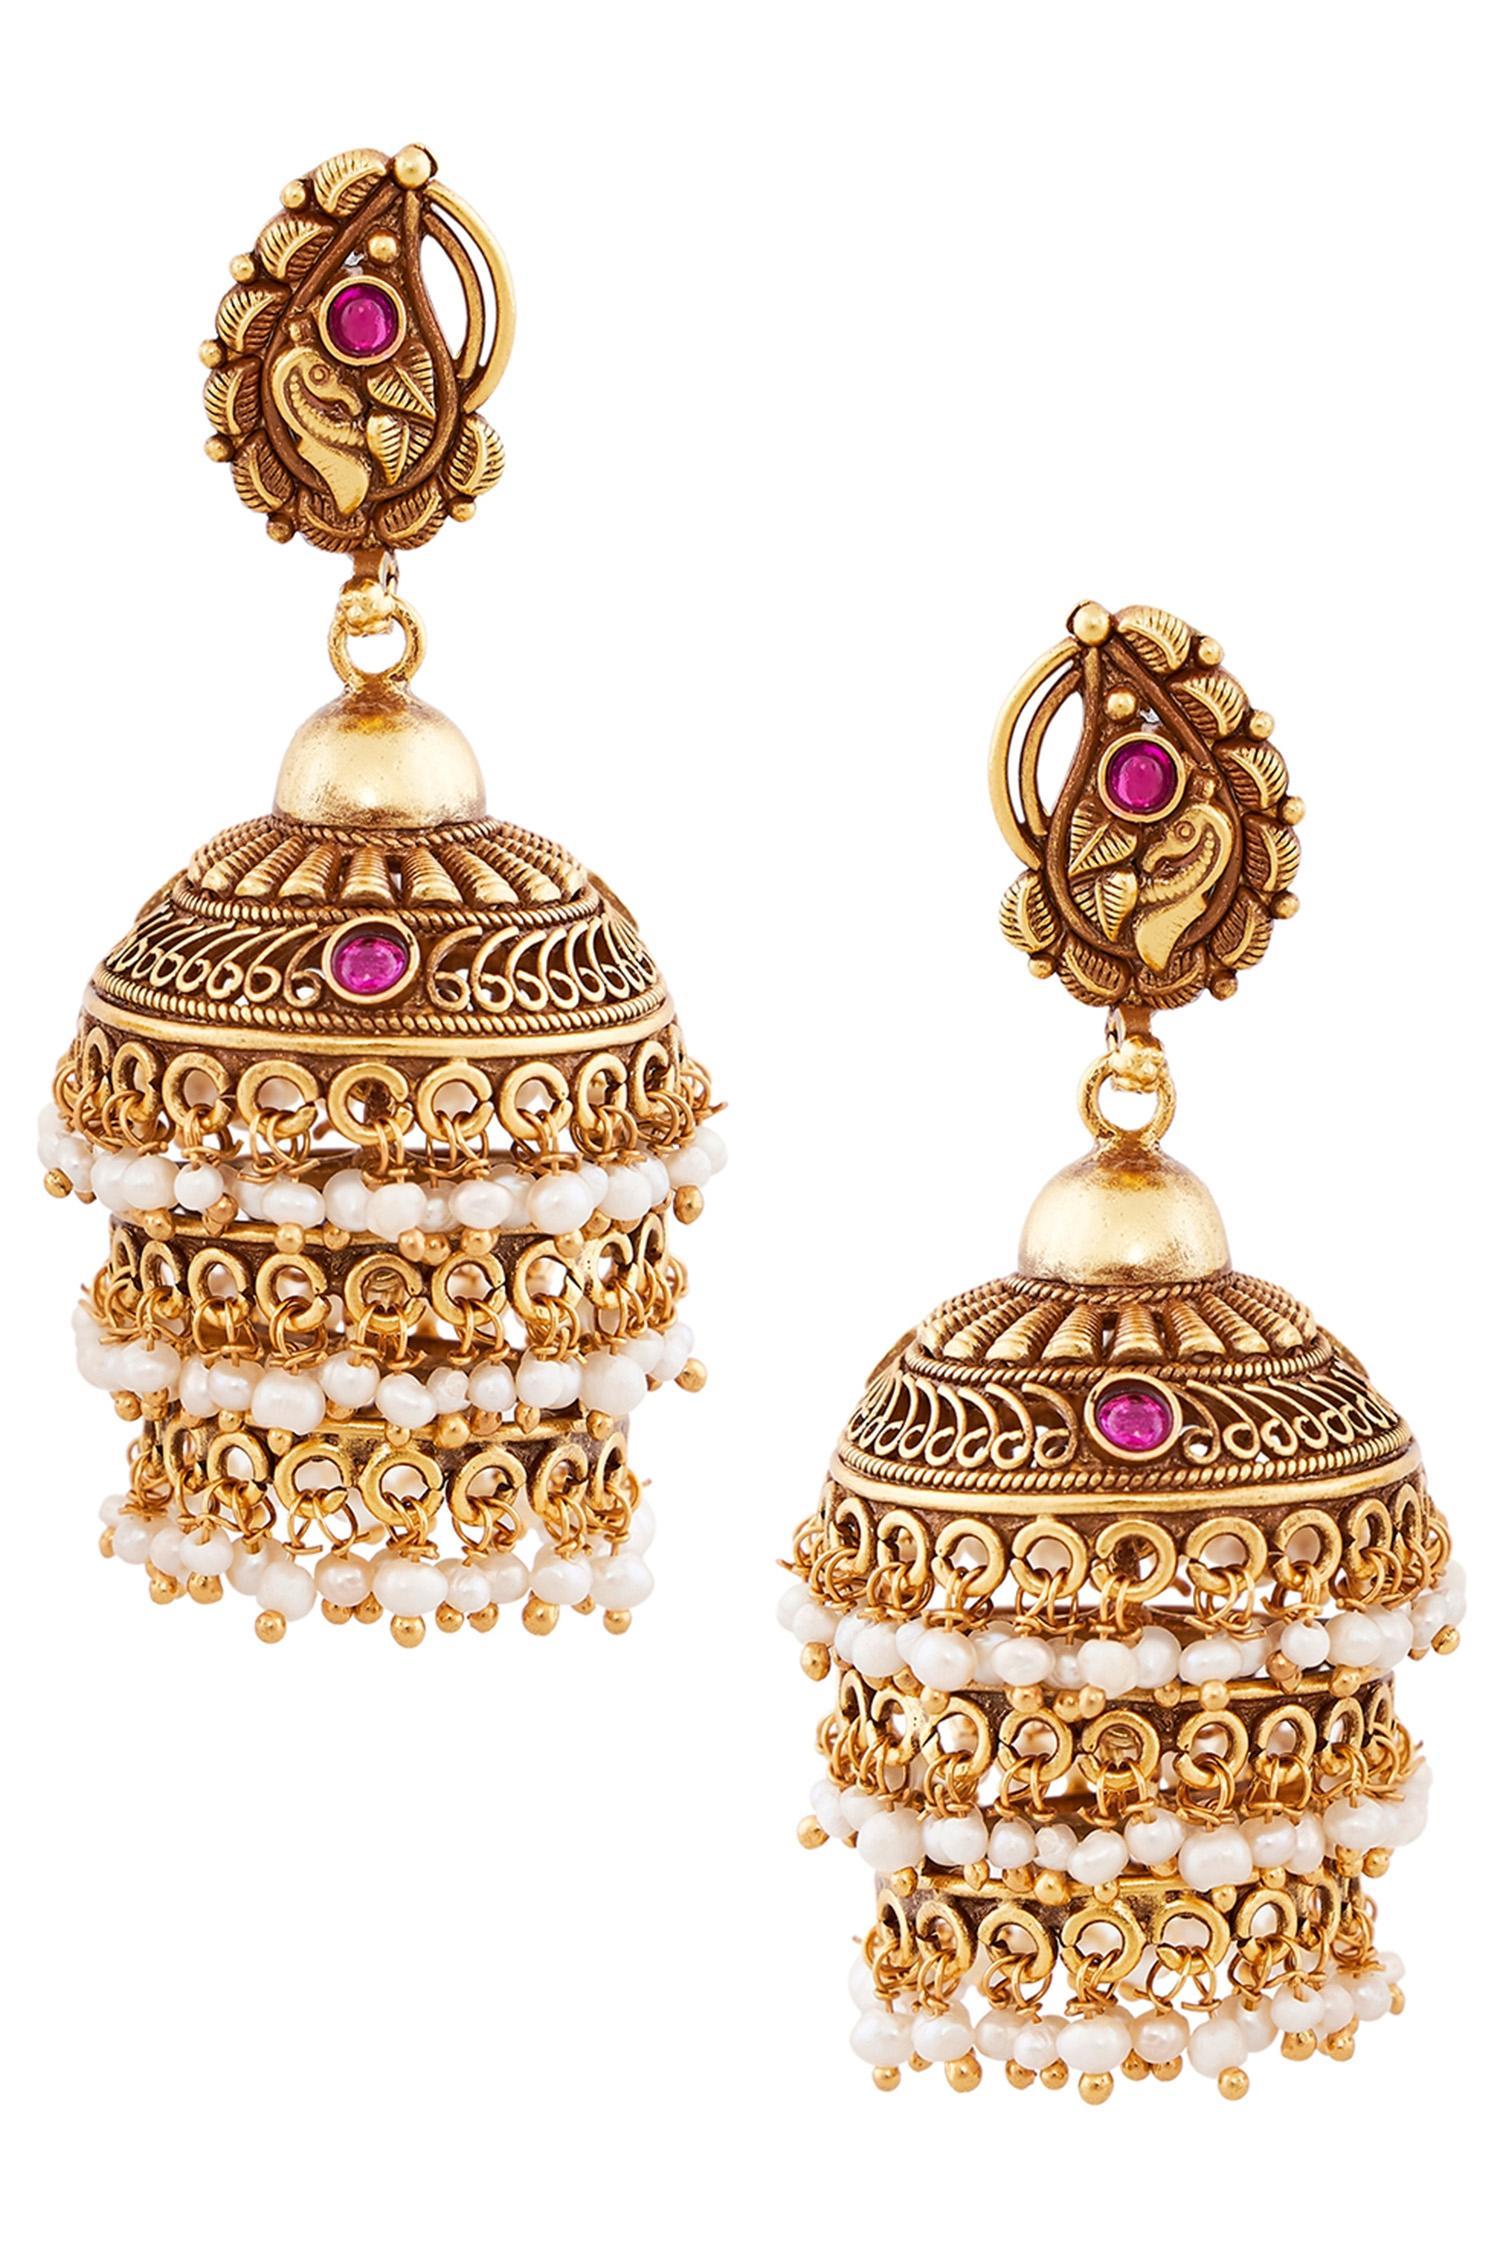 Filigree Architecture Inspired Temple Jhumki Earrings